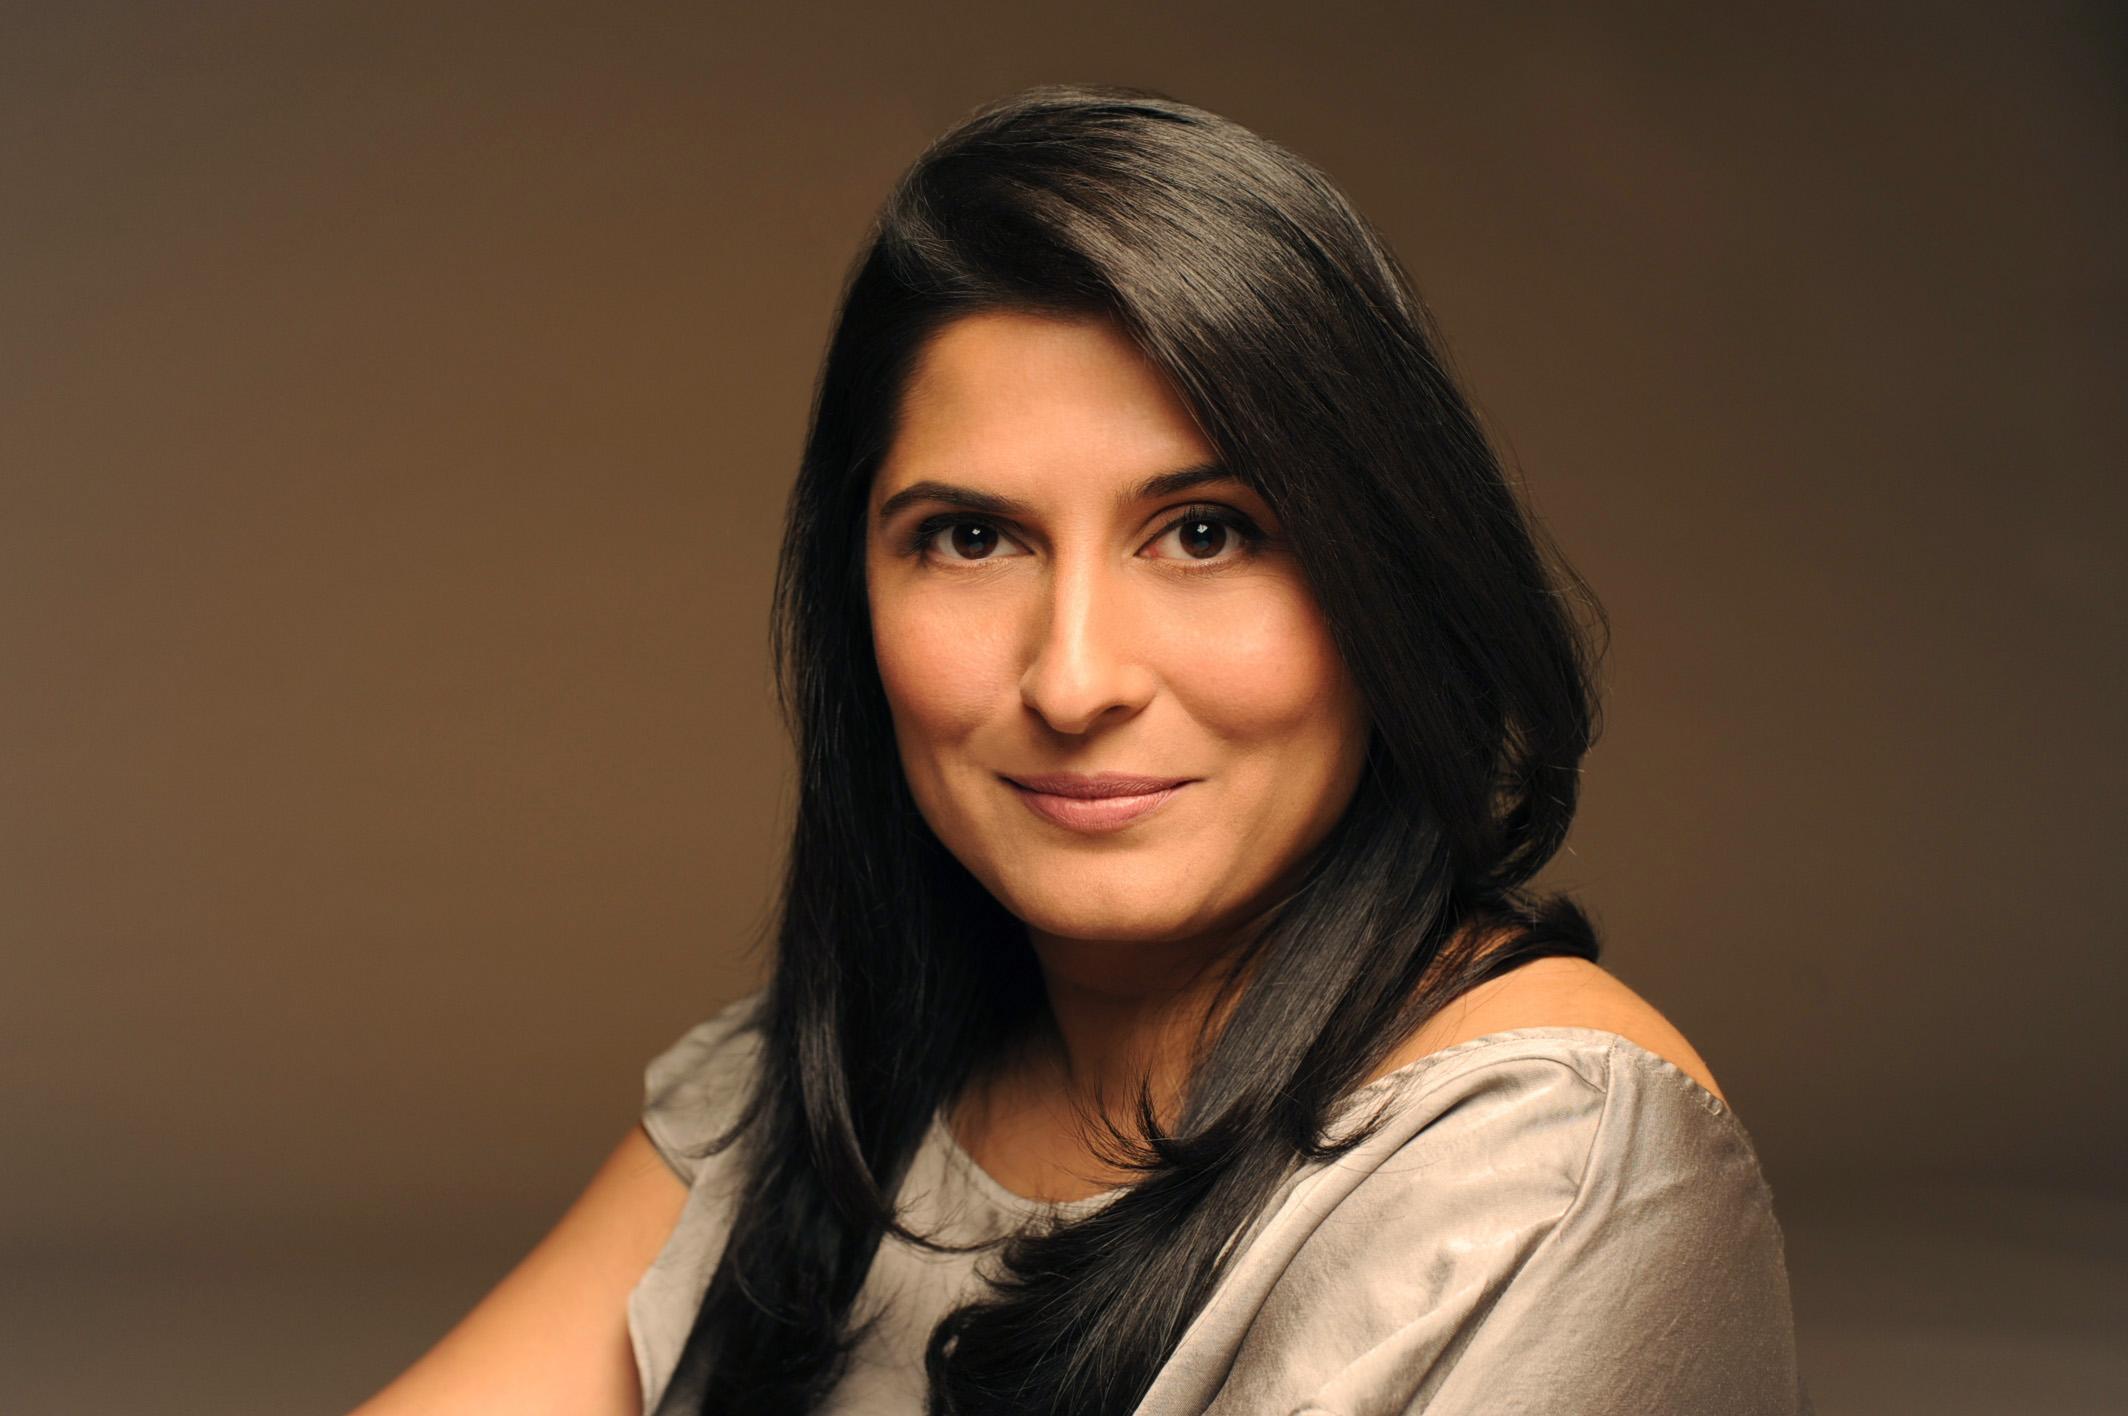 FLYING HIGH: Sharmeen Obaid-Chinoy